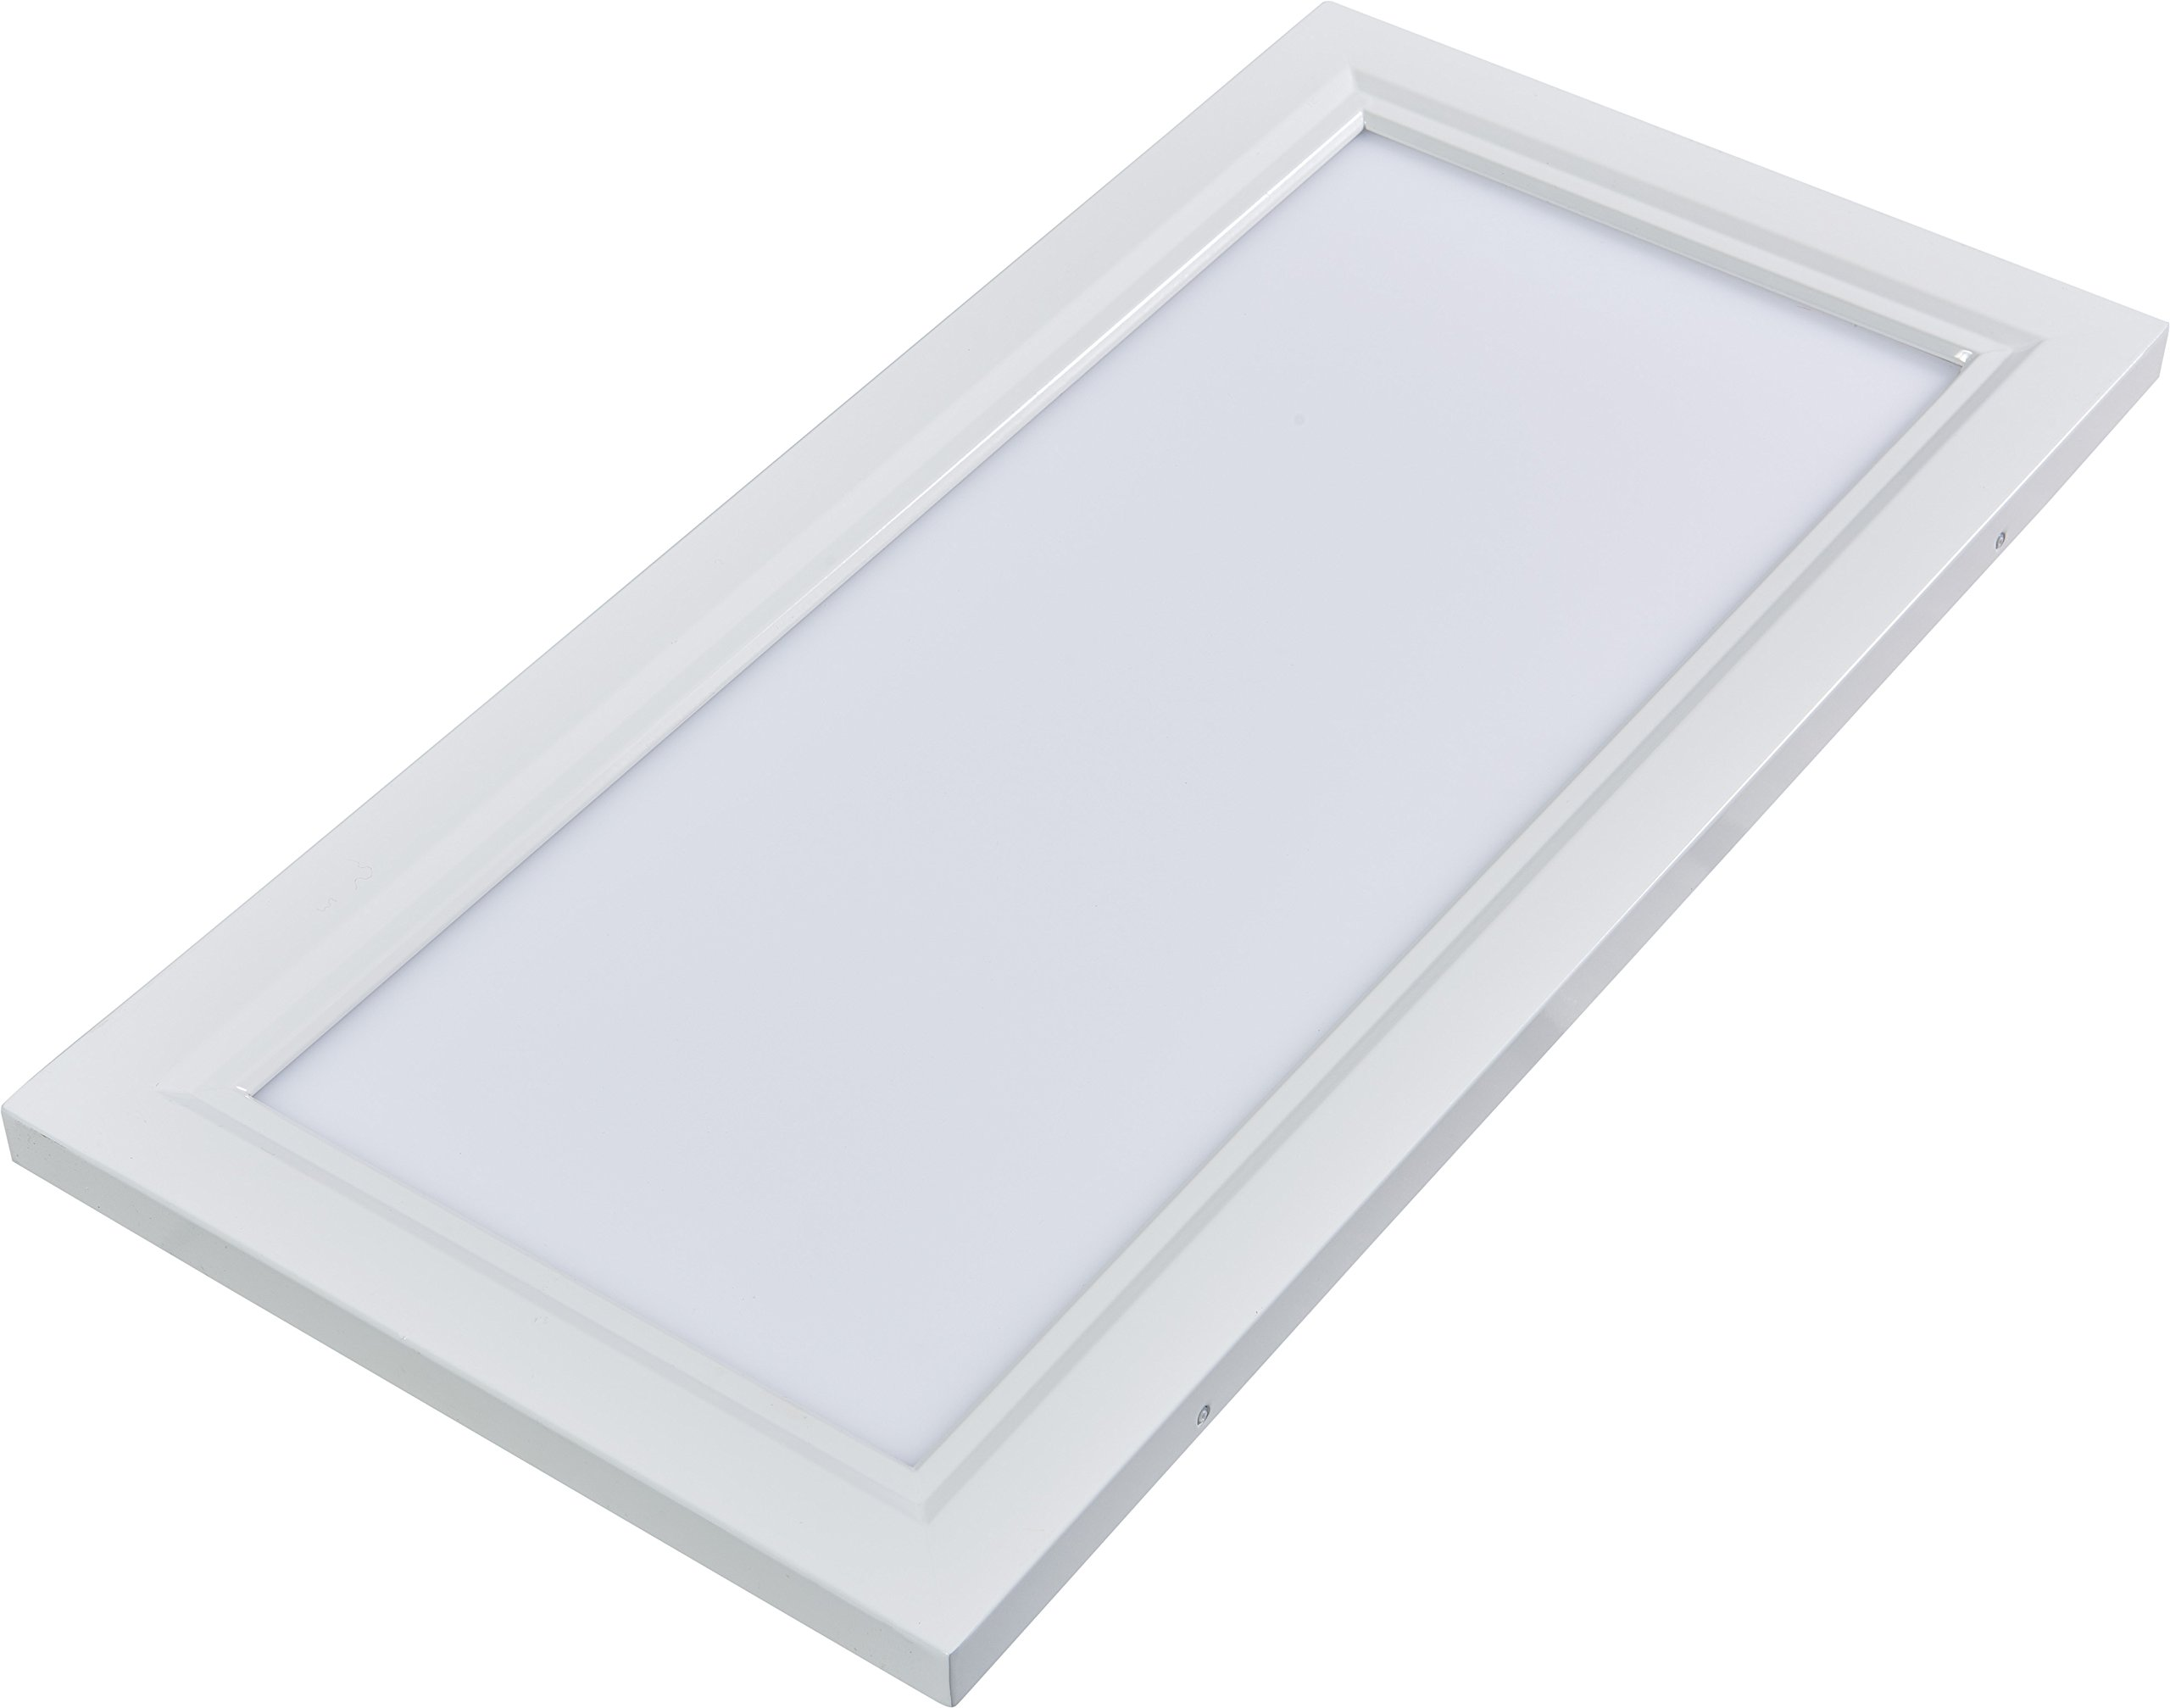 Inti Lighting 1'x2' Dimmable 15 Watt LED Flush Mount Troffer Flat Panel Light 3000K Bright White